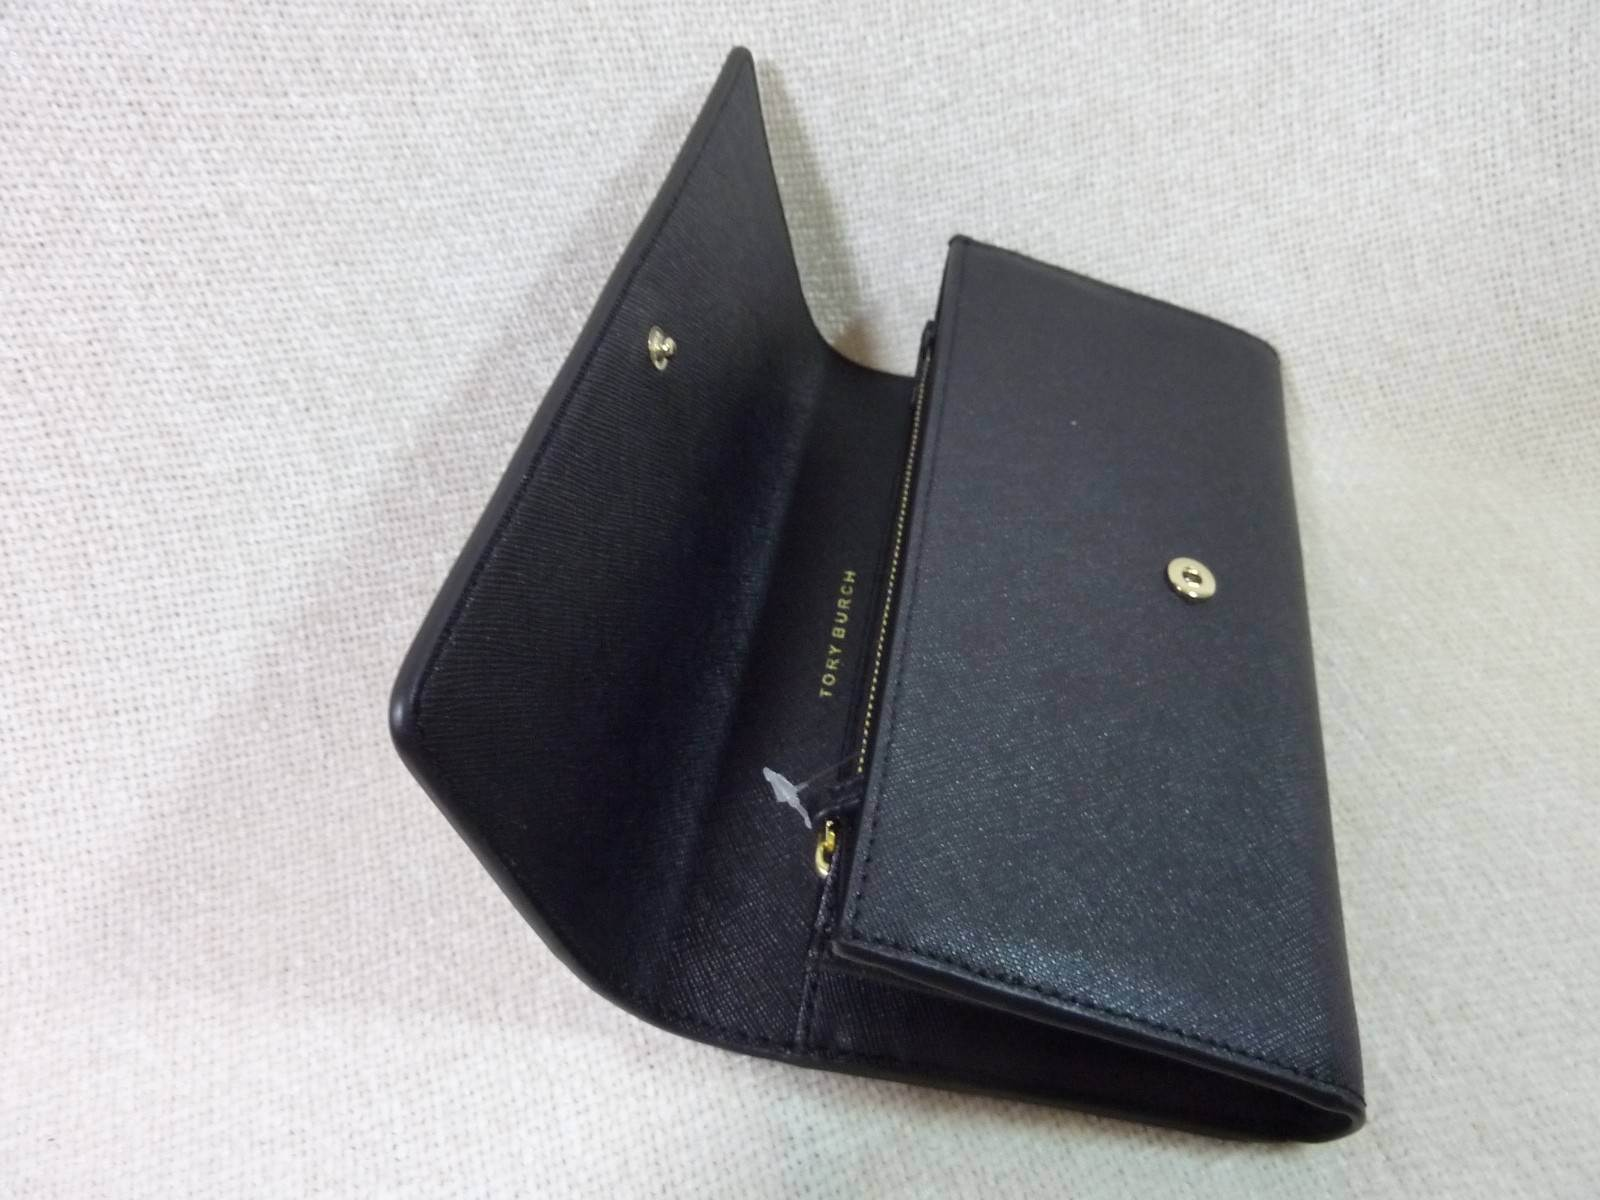 NWT Tory Burch Classic Black Saffiano Robinson Middy Satchel + Wallet $800